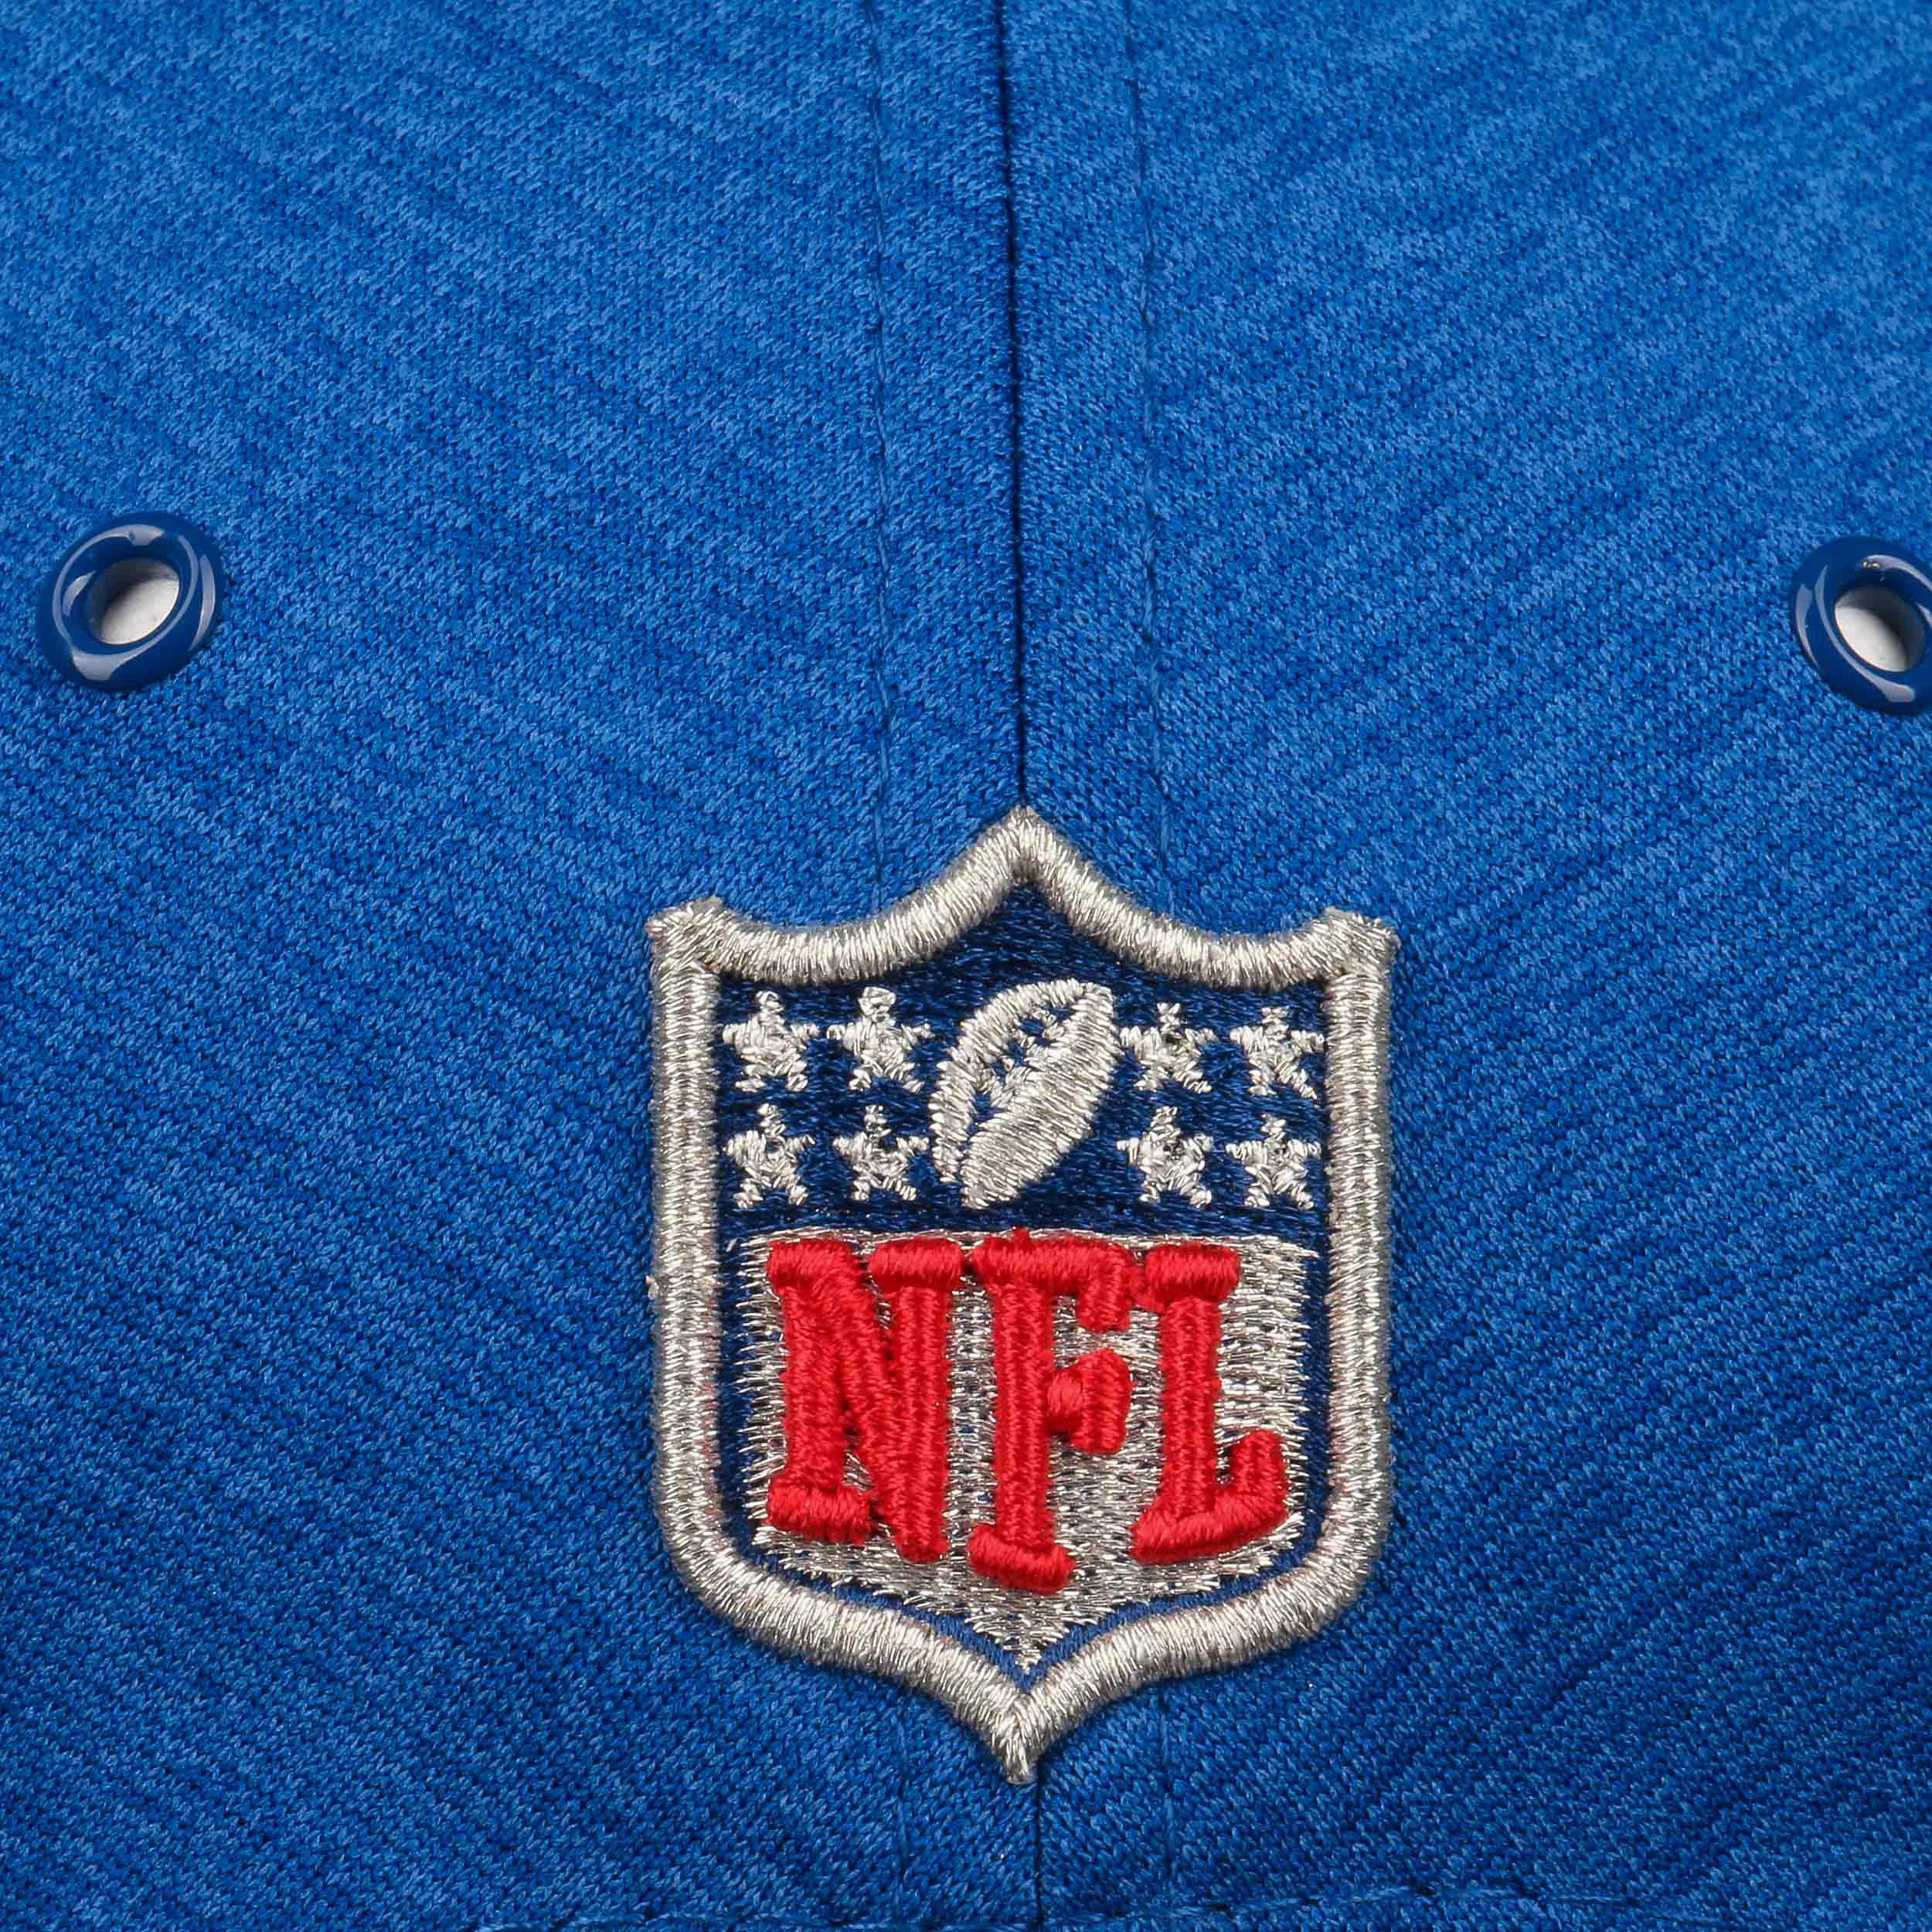 be6cc35de10 ... 9Fifty On-Field 18 Bills Cap by New Era - blue 5 ...